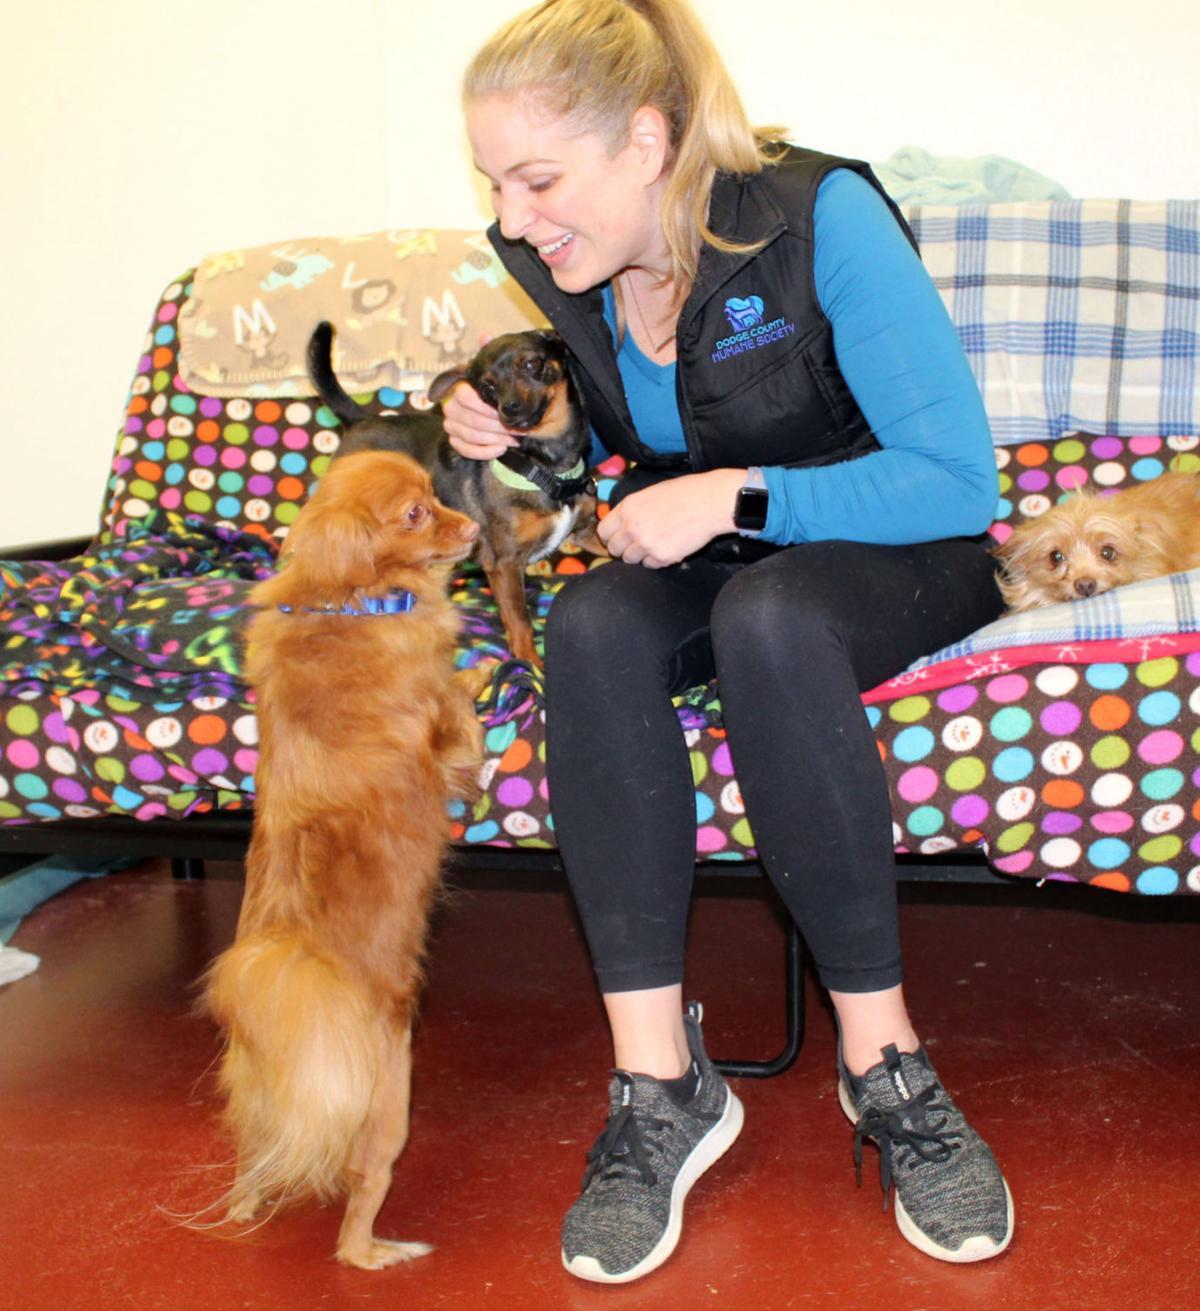 Dodge County Humane Society Director Kensie Drinkwater